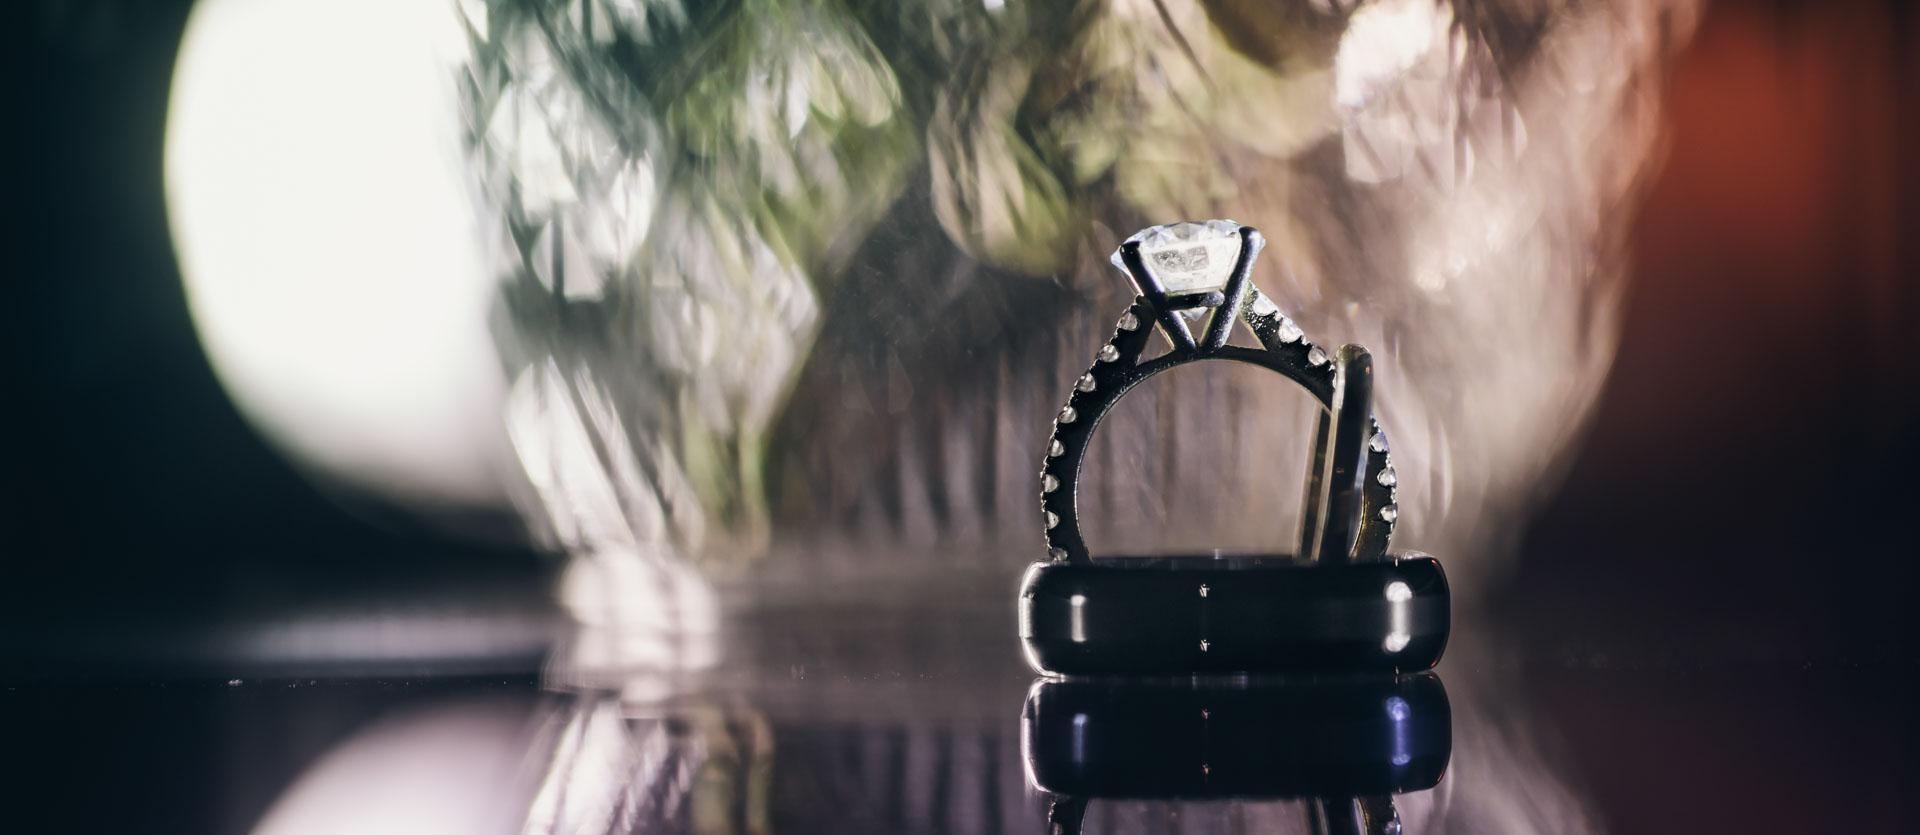 villasis-rings